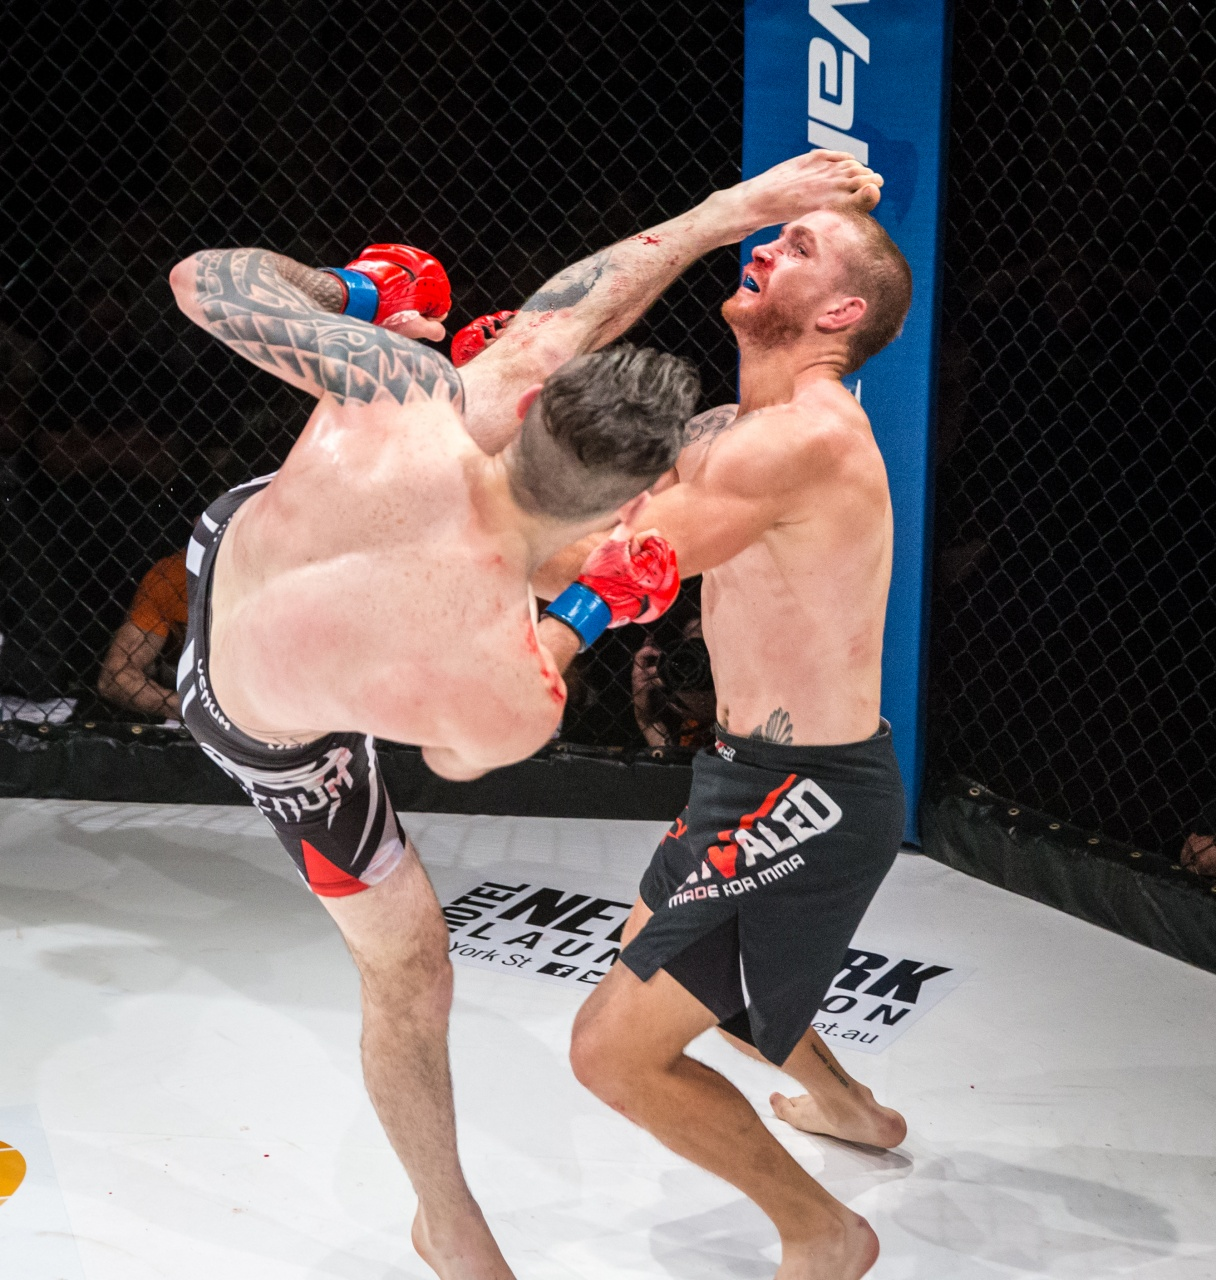 Adam Trickey vs David Butt